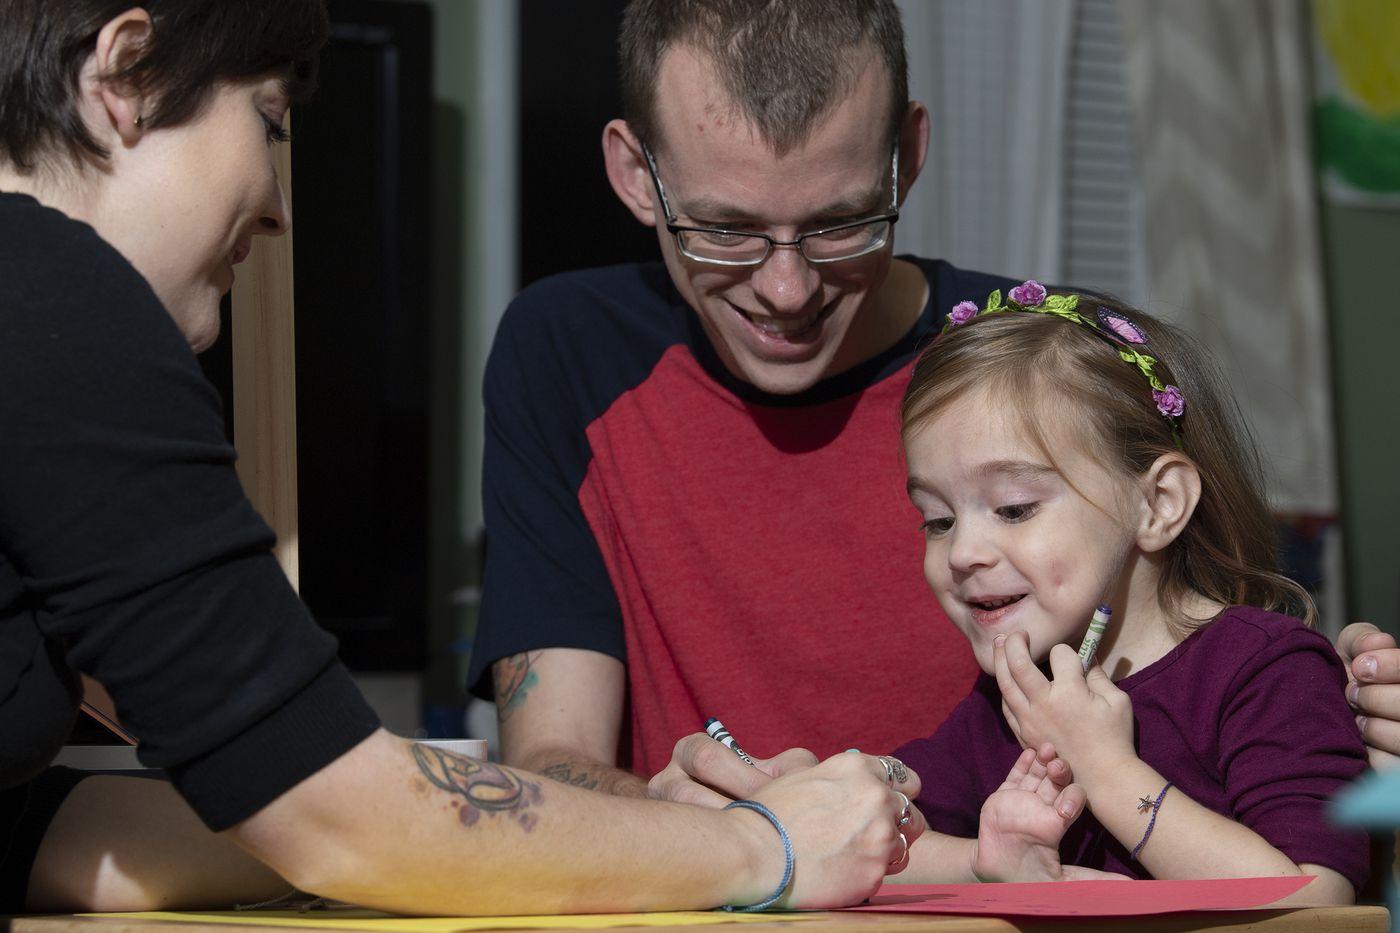 'Polio-like' illness strikes two more in PA, NJ